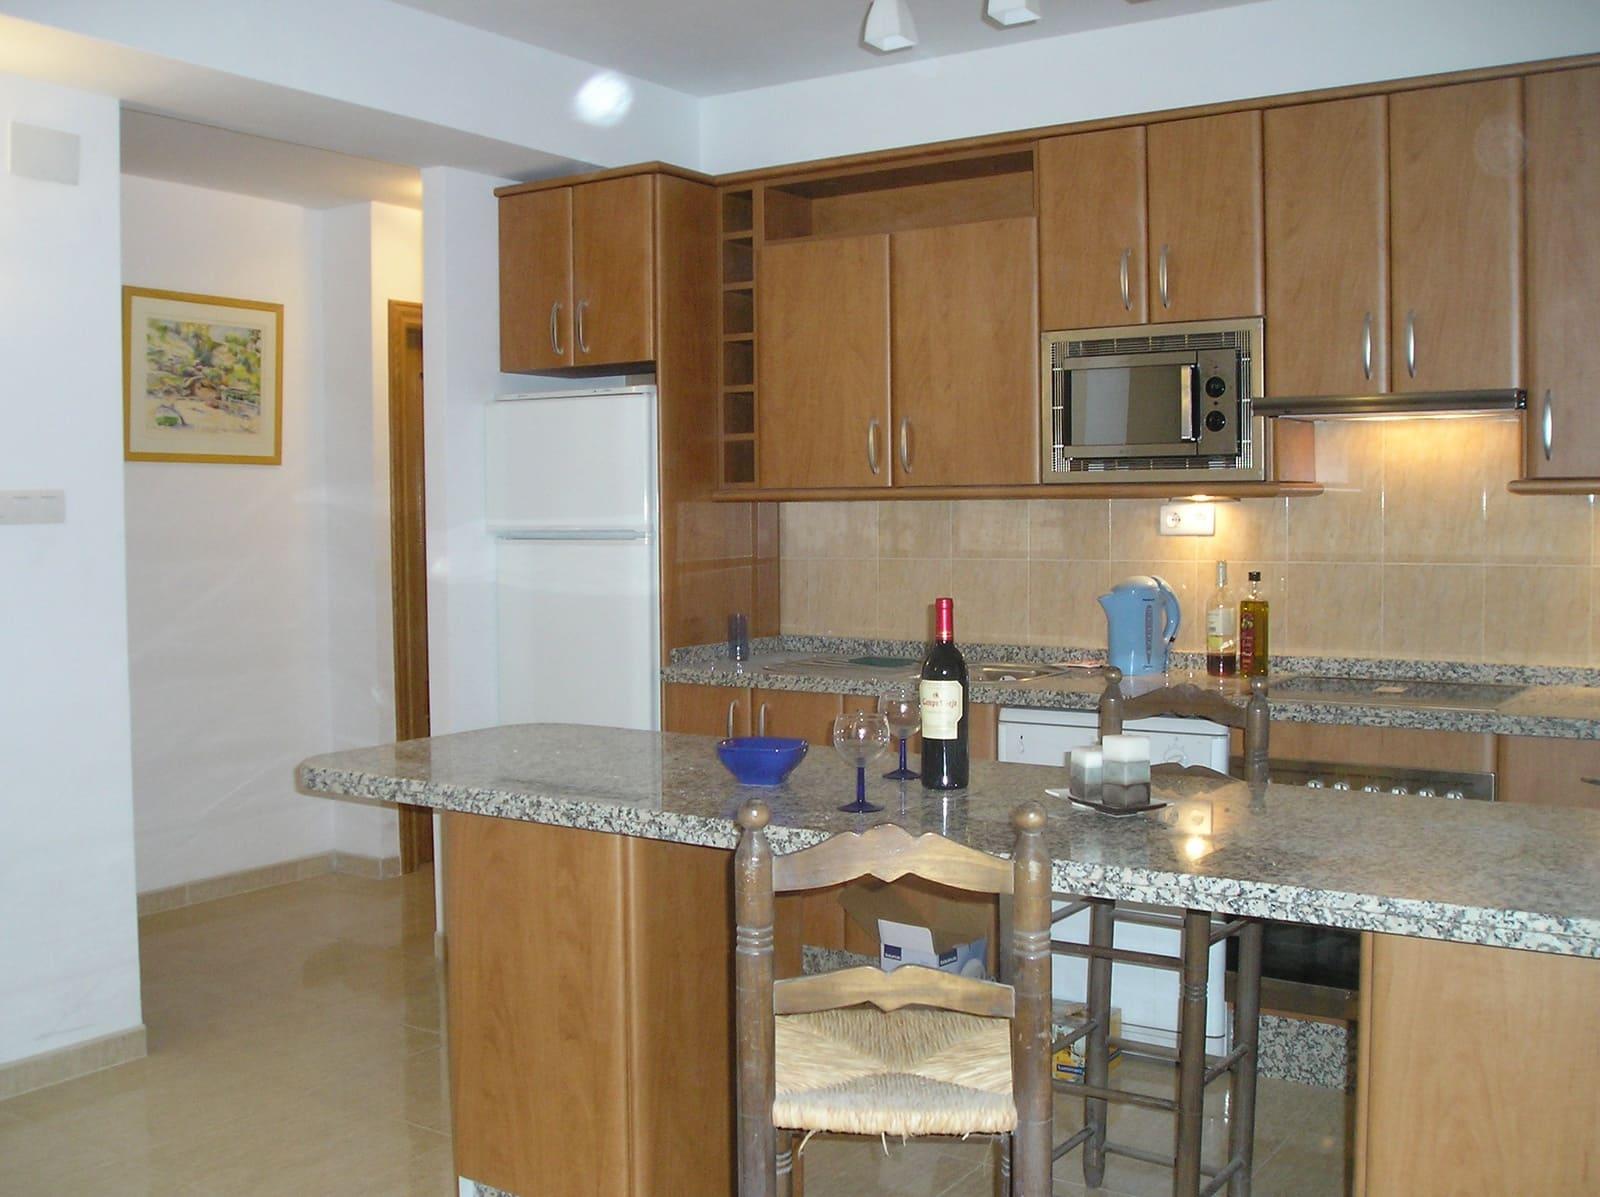 2 bedroom Apartment for sale in Granada city - € 185,000 (Ref: 1059331)